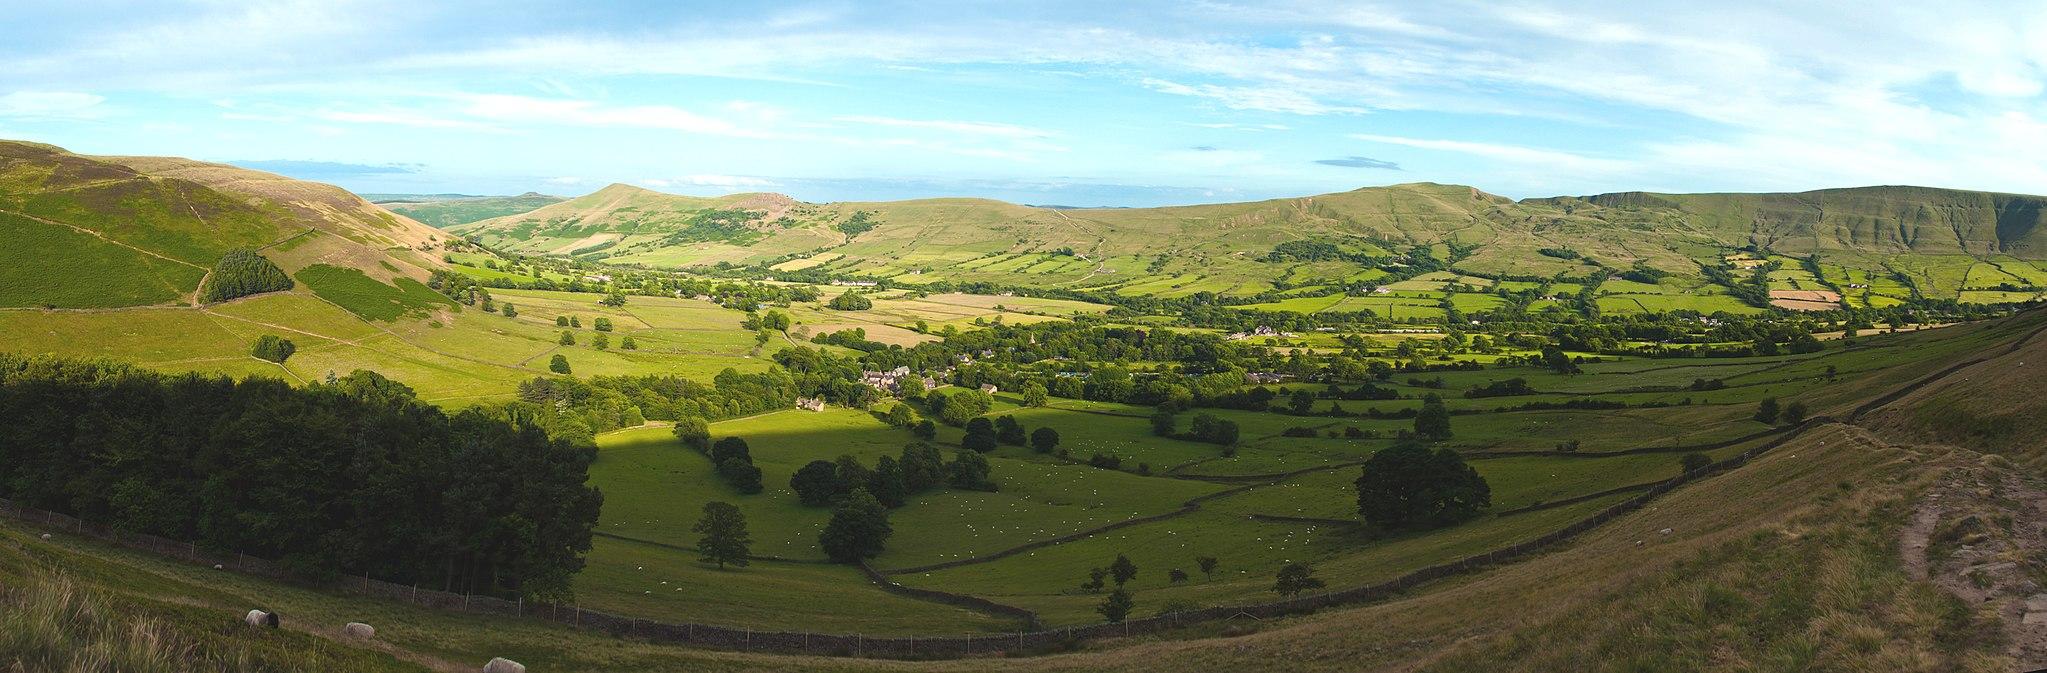 Vale of Edale (Photo by Atomviz, Wikimedia Commons)